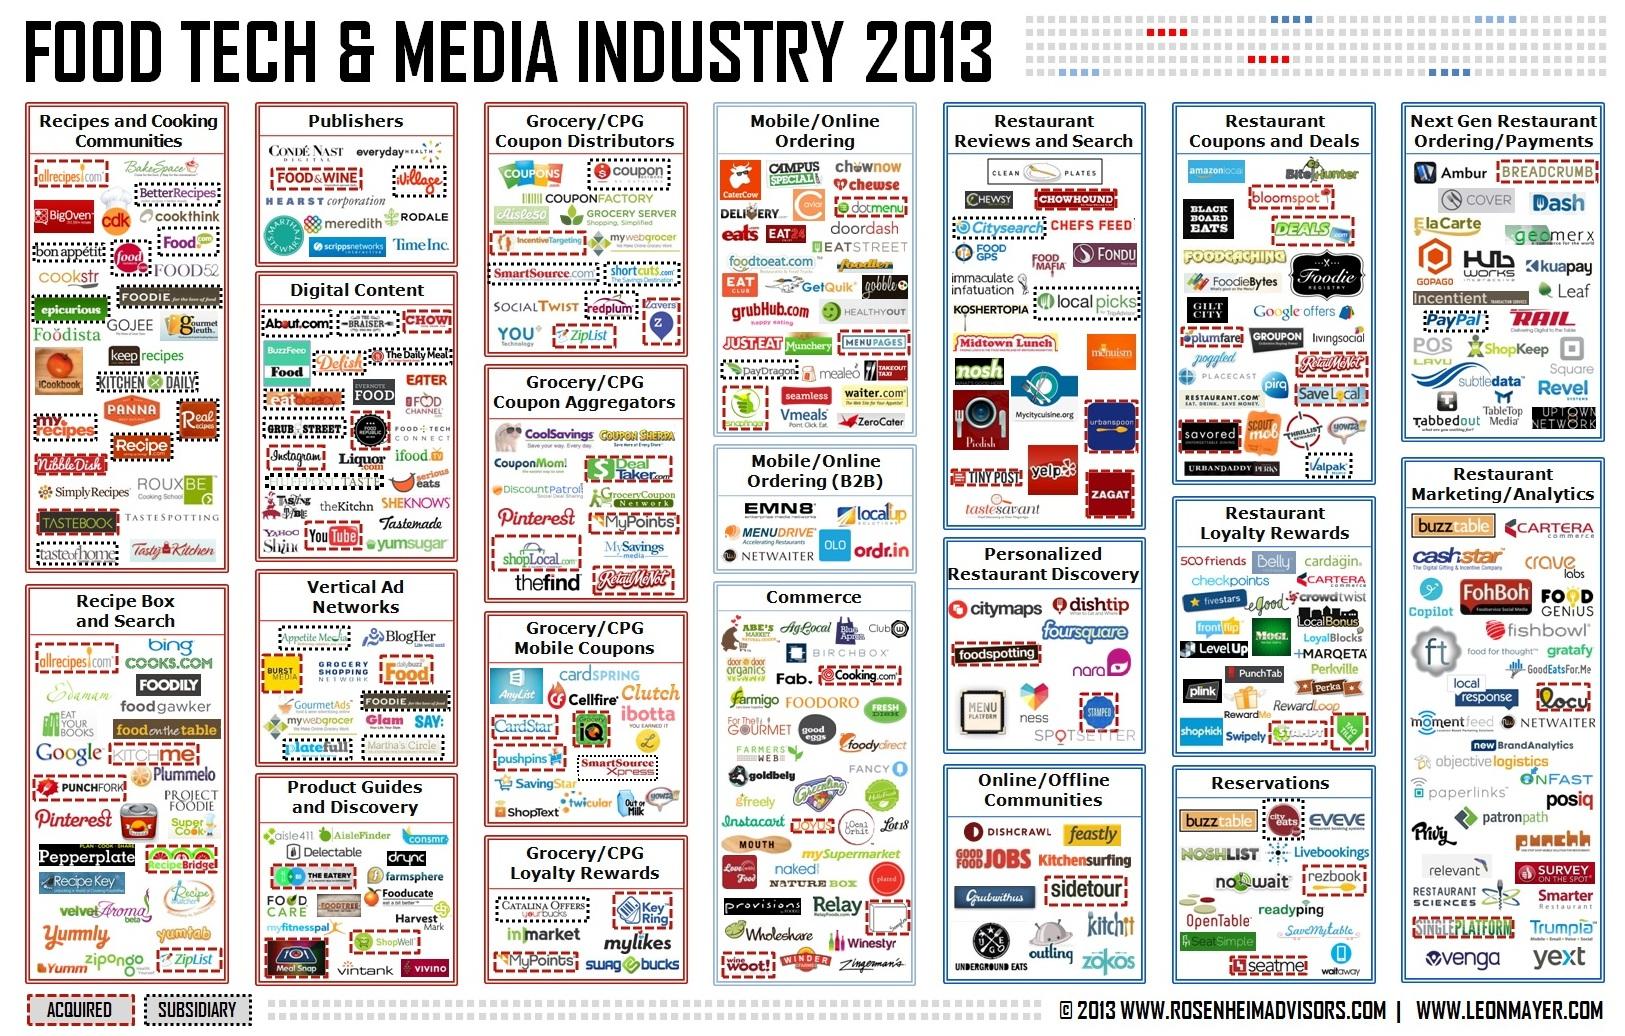 Food Tech and Media Industry 2013 - Rosenheim Advisors and Leon Mayer